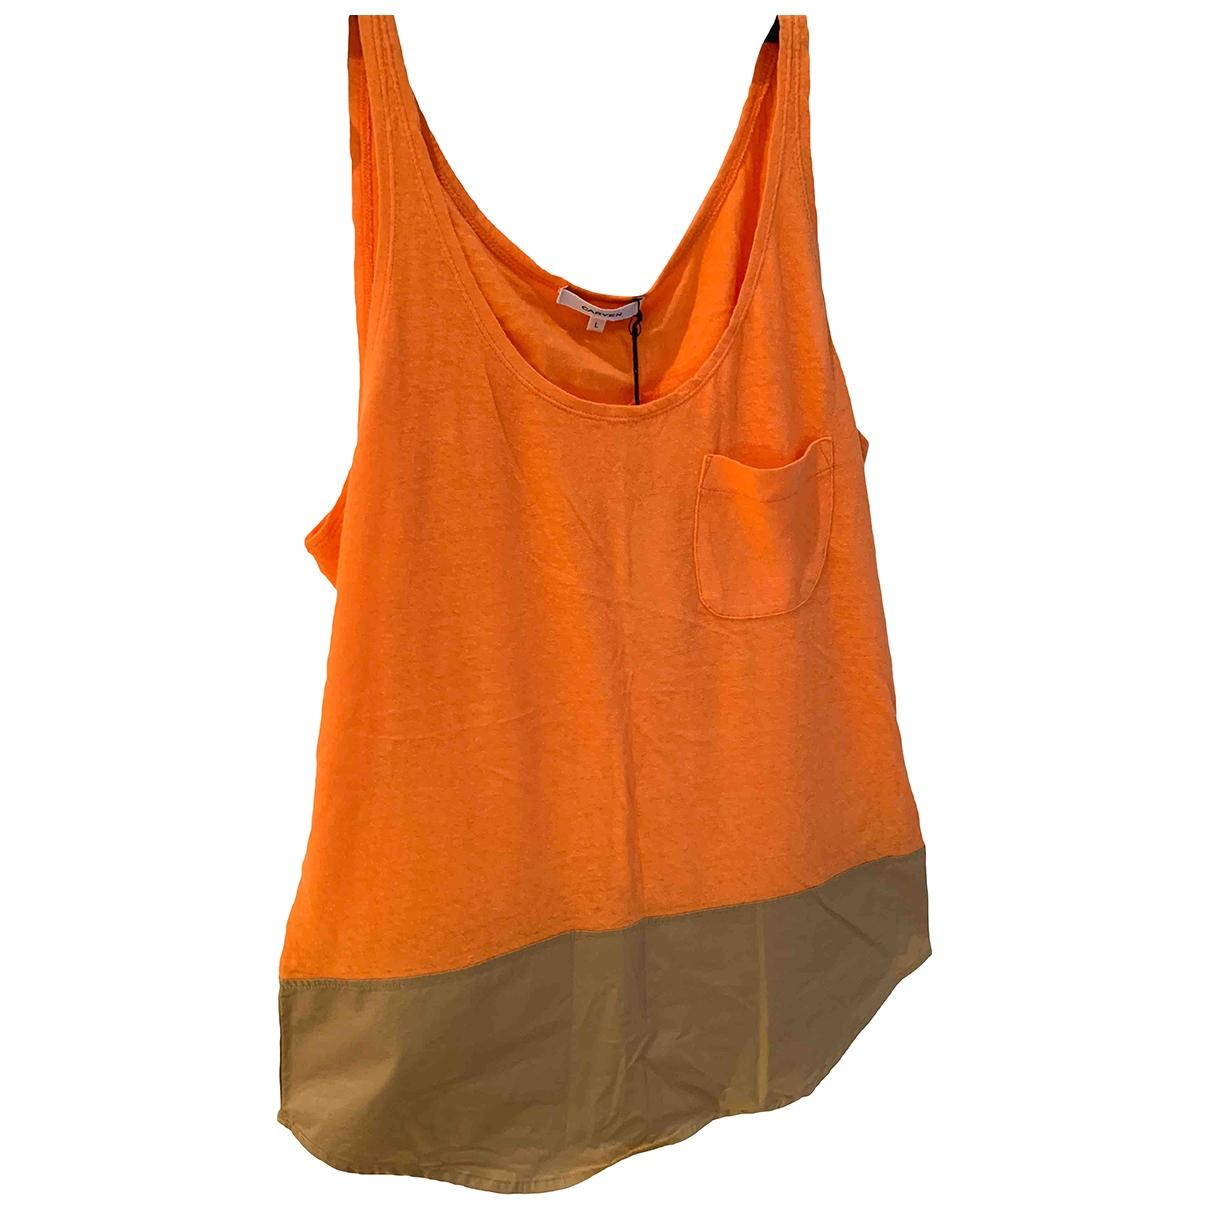 Carven \N Orange Cotton  top for Women L International